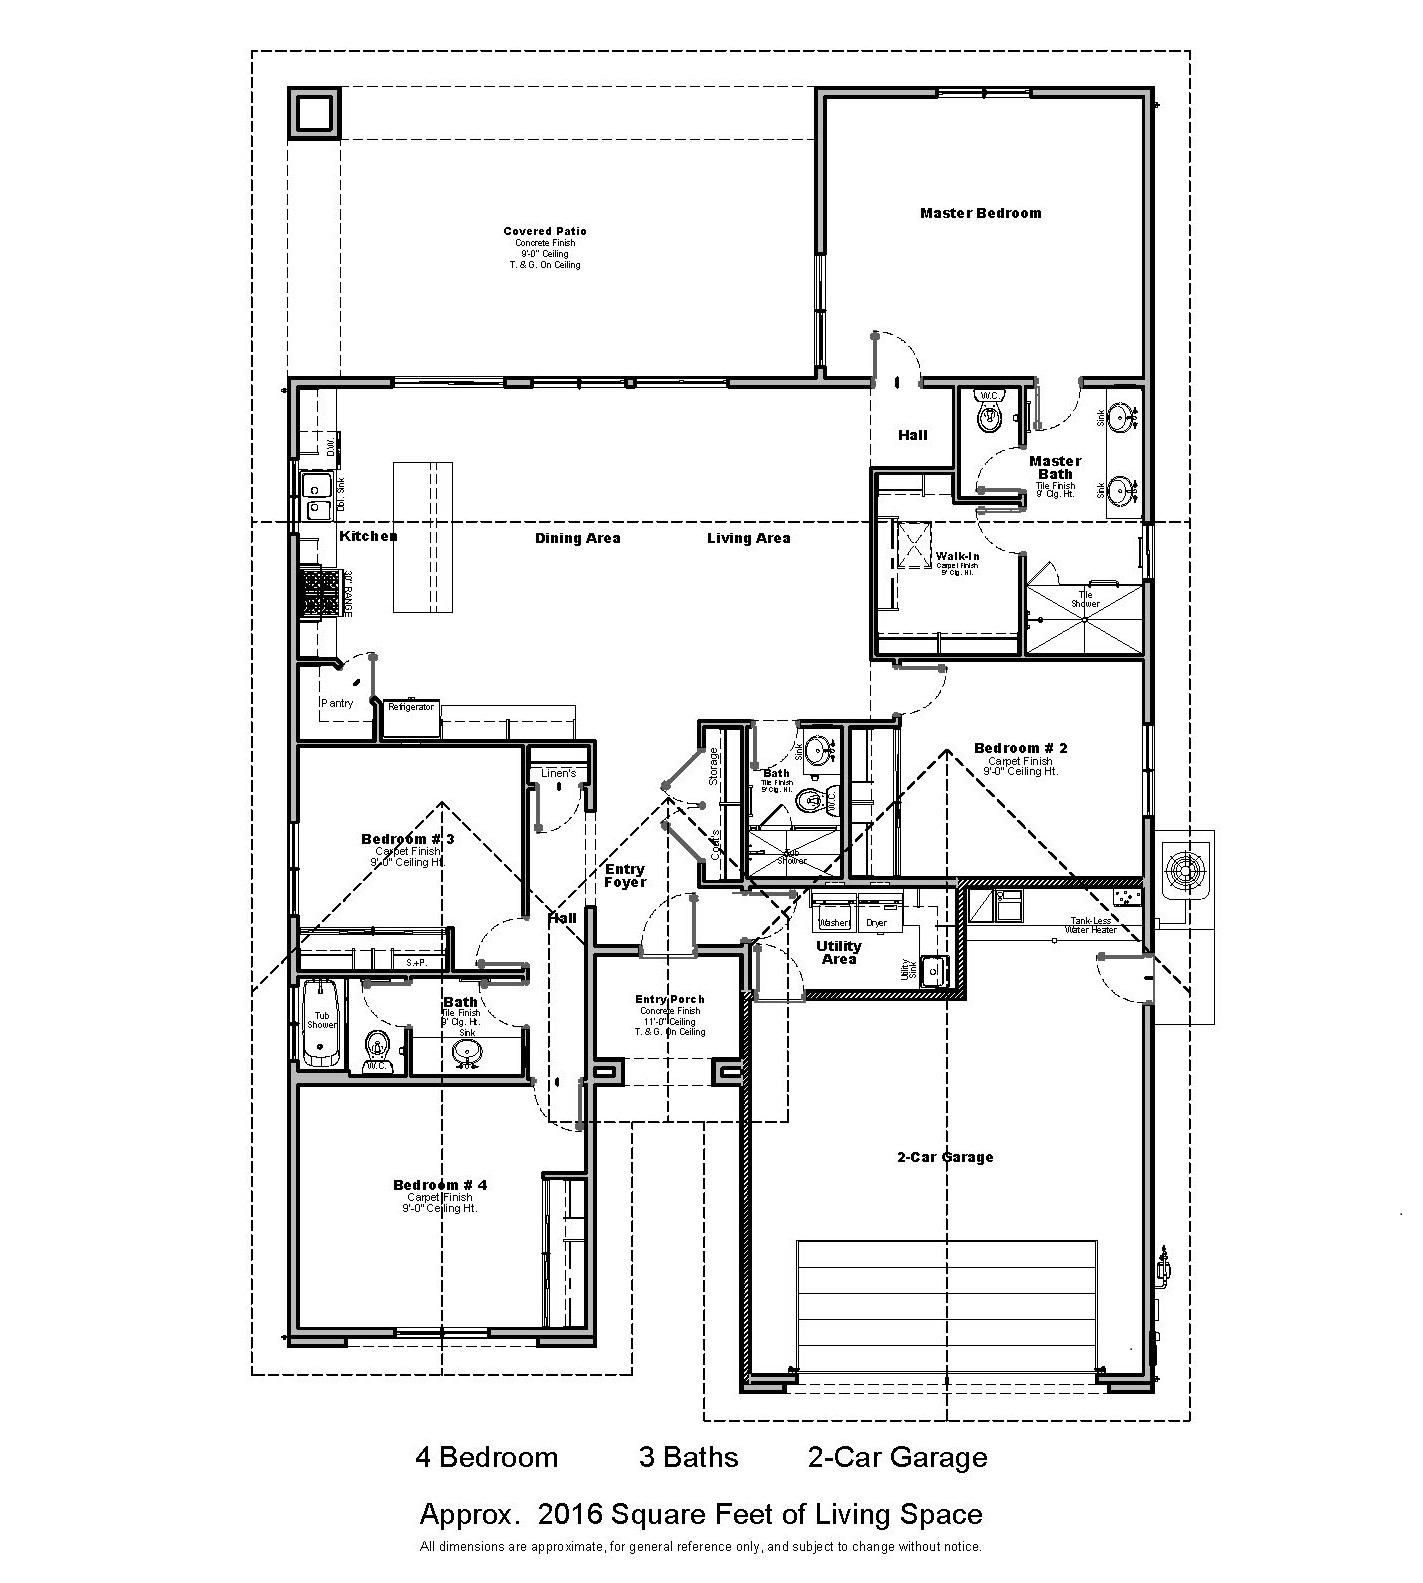 68410 Perlita Road, Cathedral City, California 92234, 4 Bedrooms Bedrooms, ,3 BathroomsBathrooms,Residential,For Sale,68410 Perlita Road,219041491